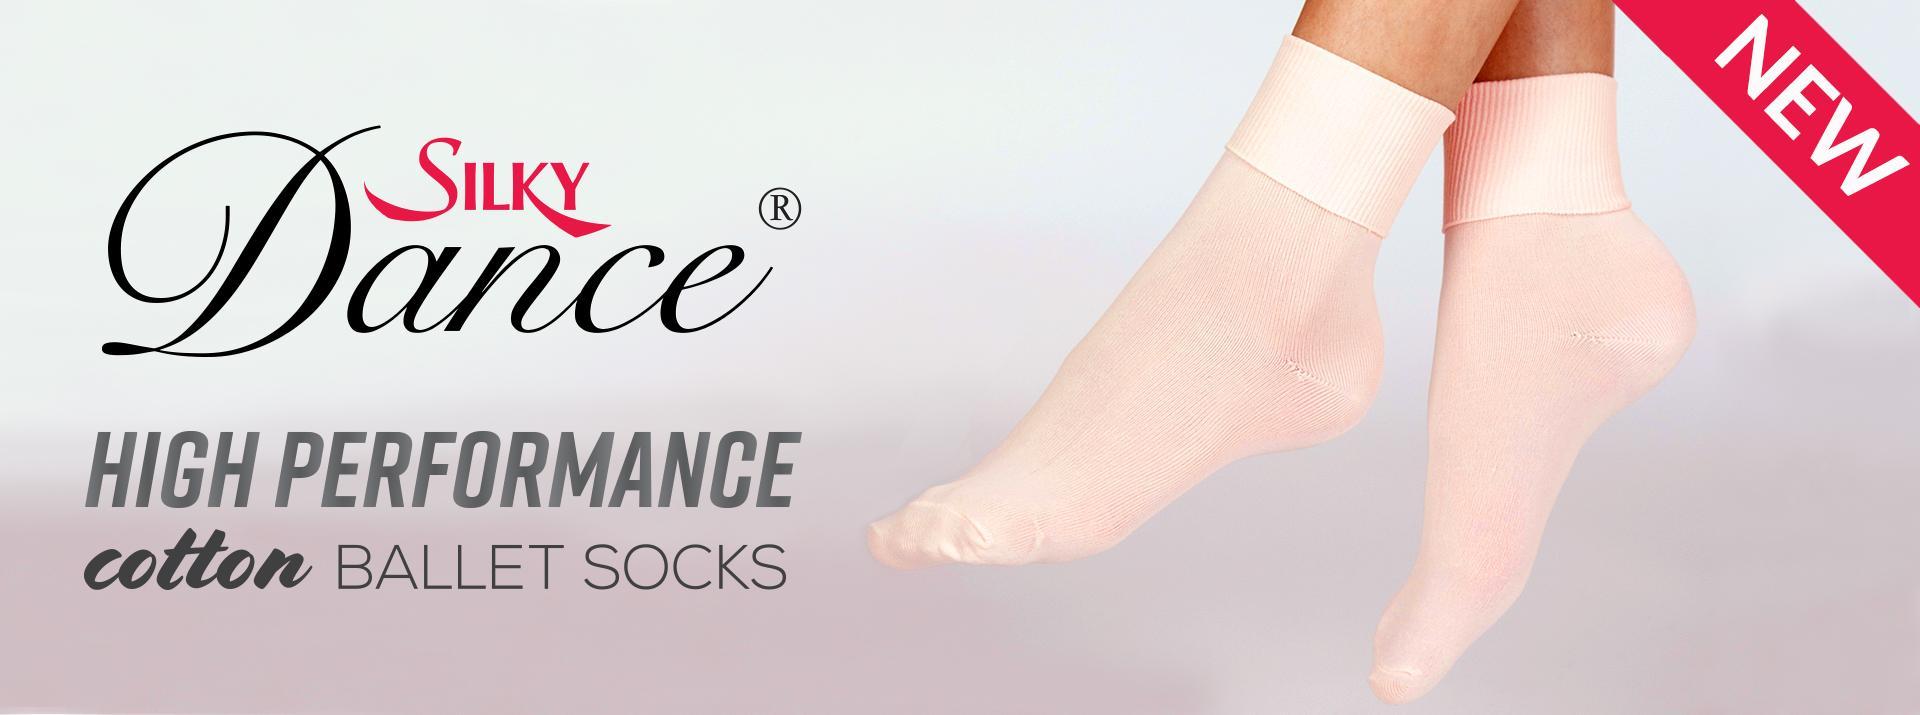 HP Cotton Ballet Socks